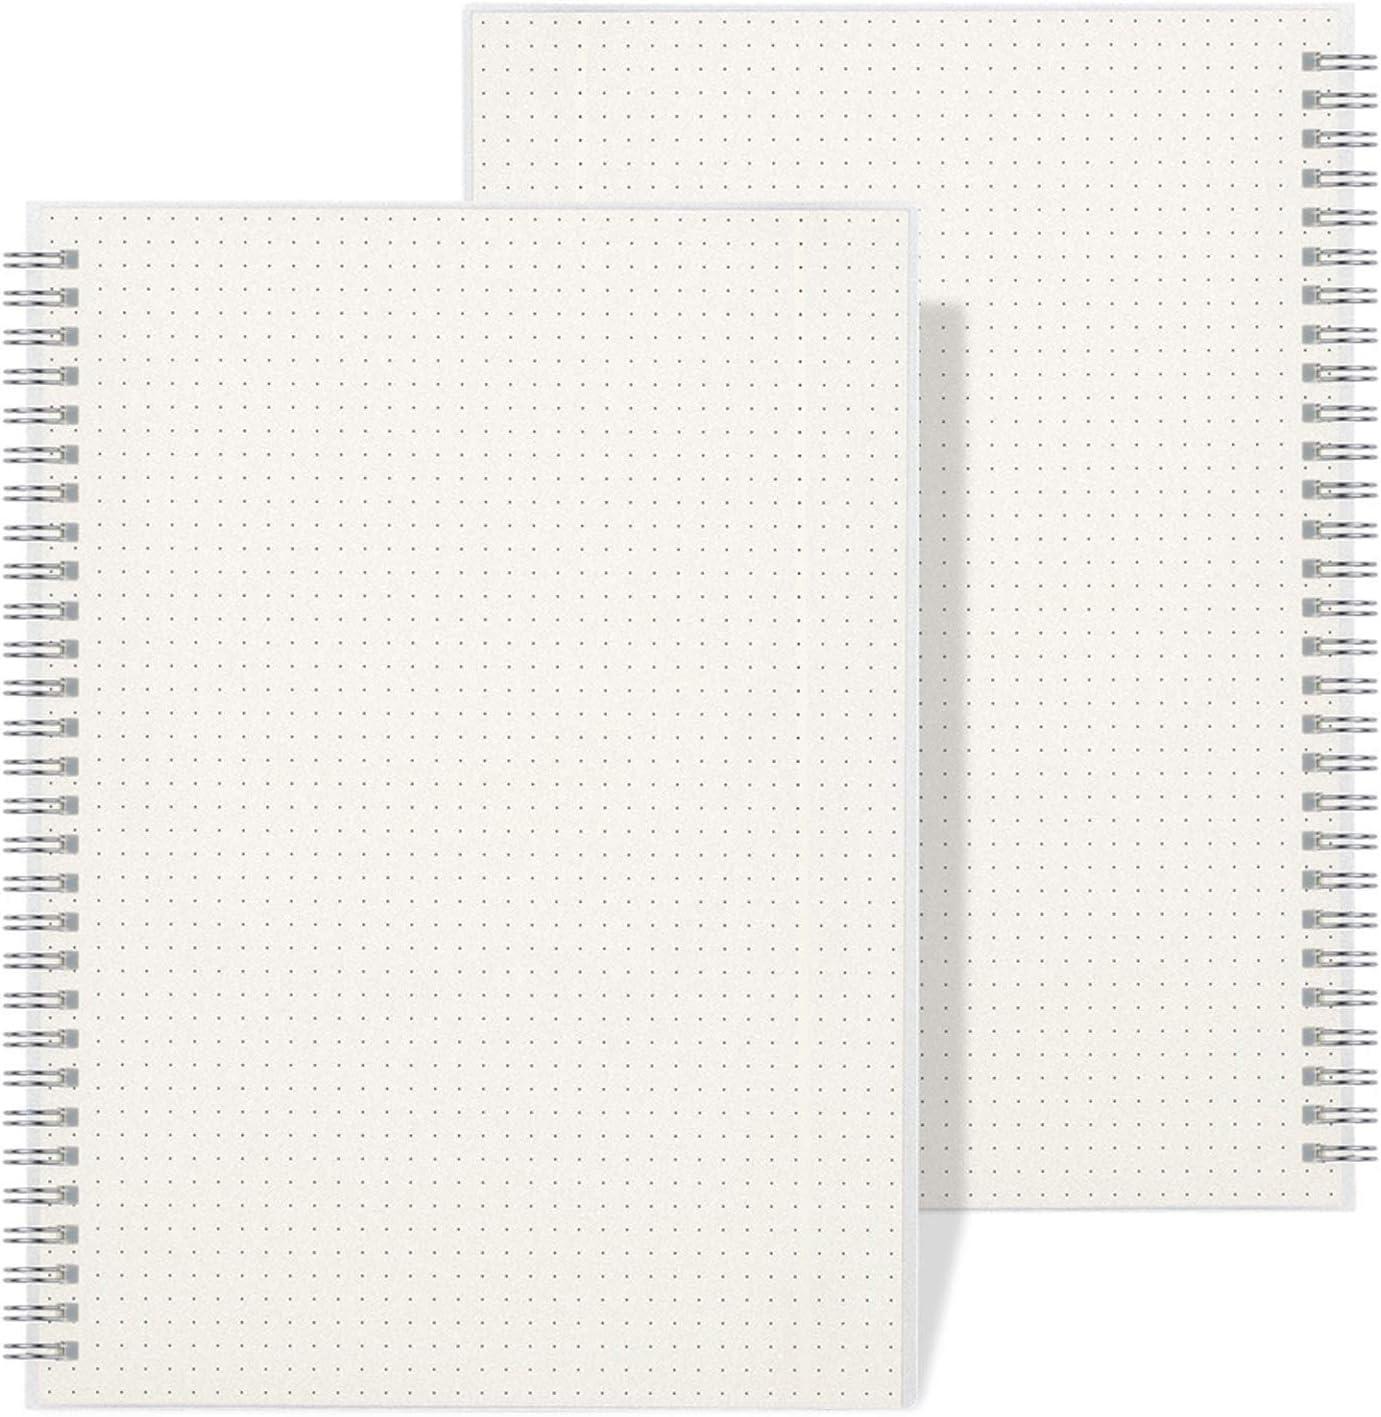 Spiral Dot Grid Notebook Wiisdatek Dotted Bullet A5 sale Journal Max 45% OFF Note